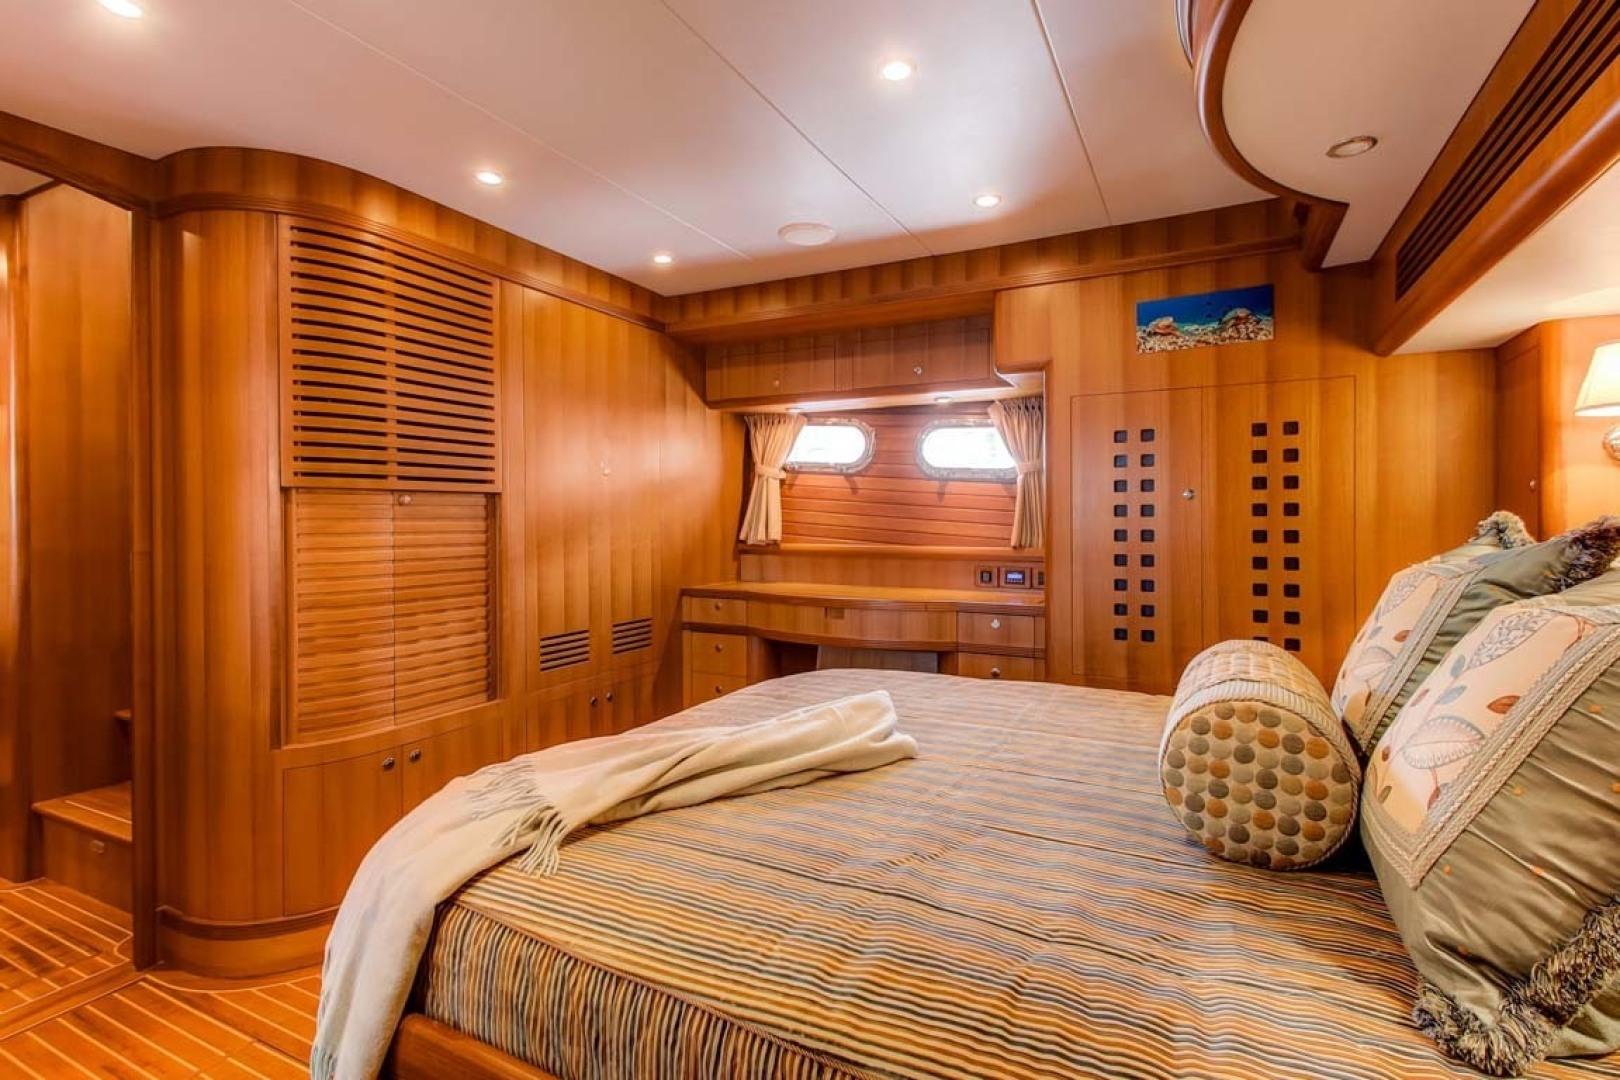 Selene-60 Ocean Trawler 2010-Gypsy Magic Jacksonville-Florida-United States-Master Stateroom-1346750   Thumbnail